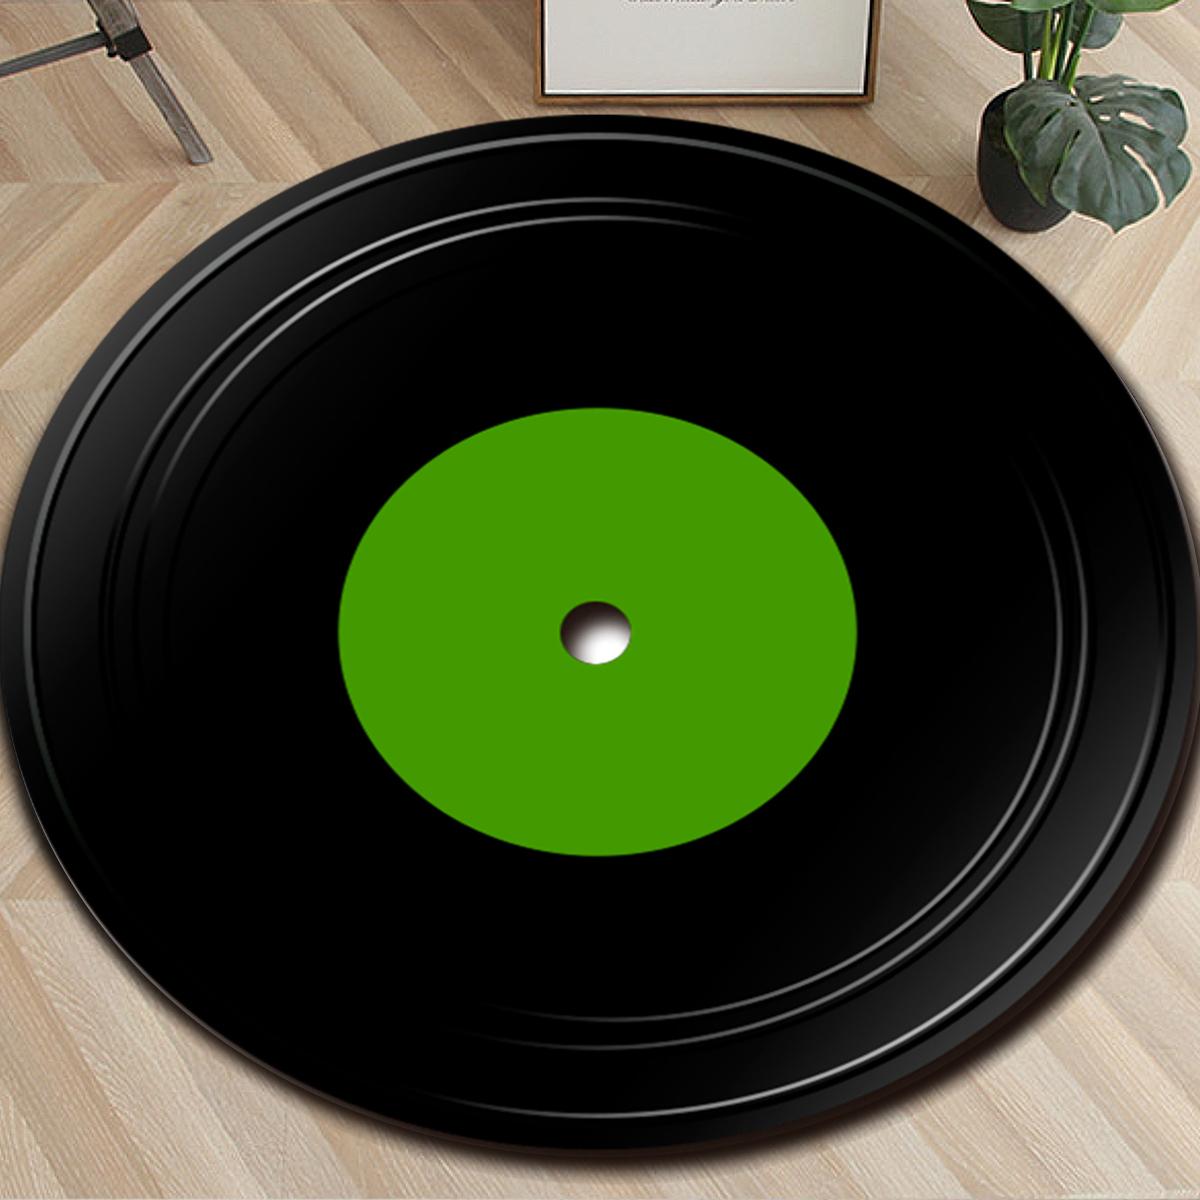 Rugs Amp Carpets Fashions Vinyl Record Carpet Round Floor